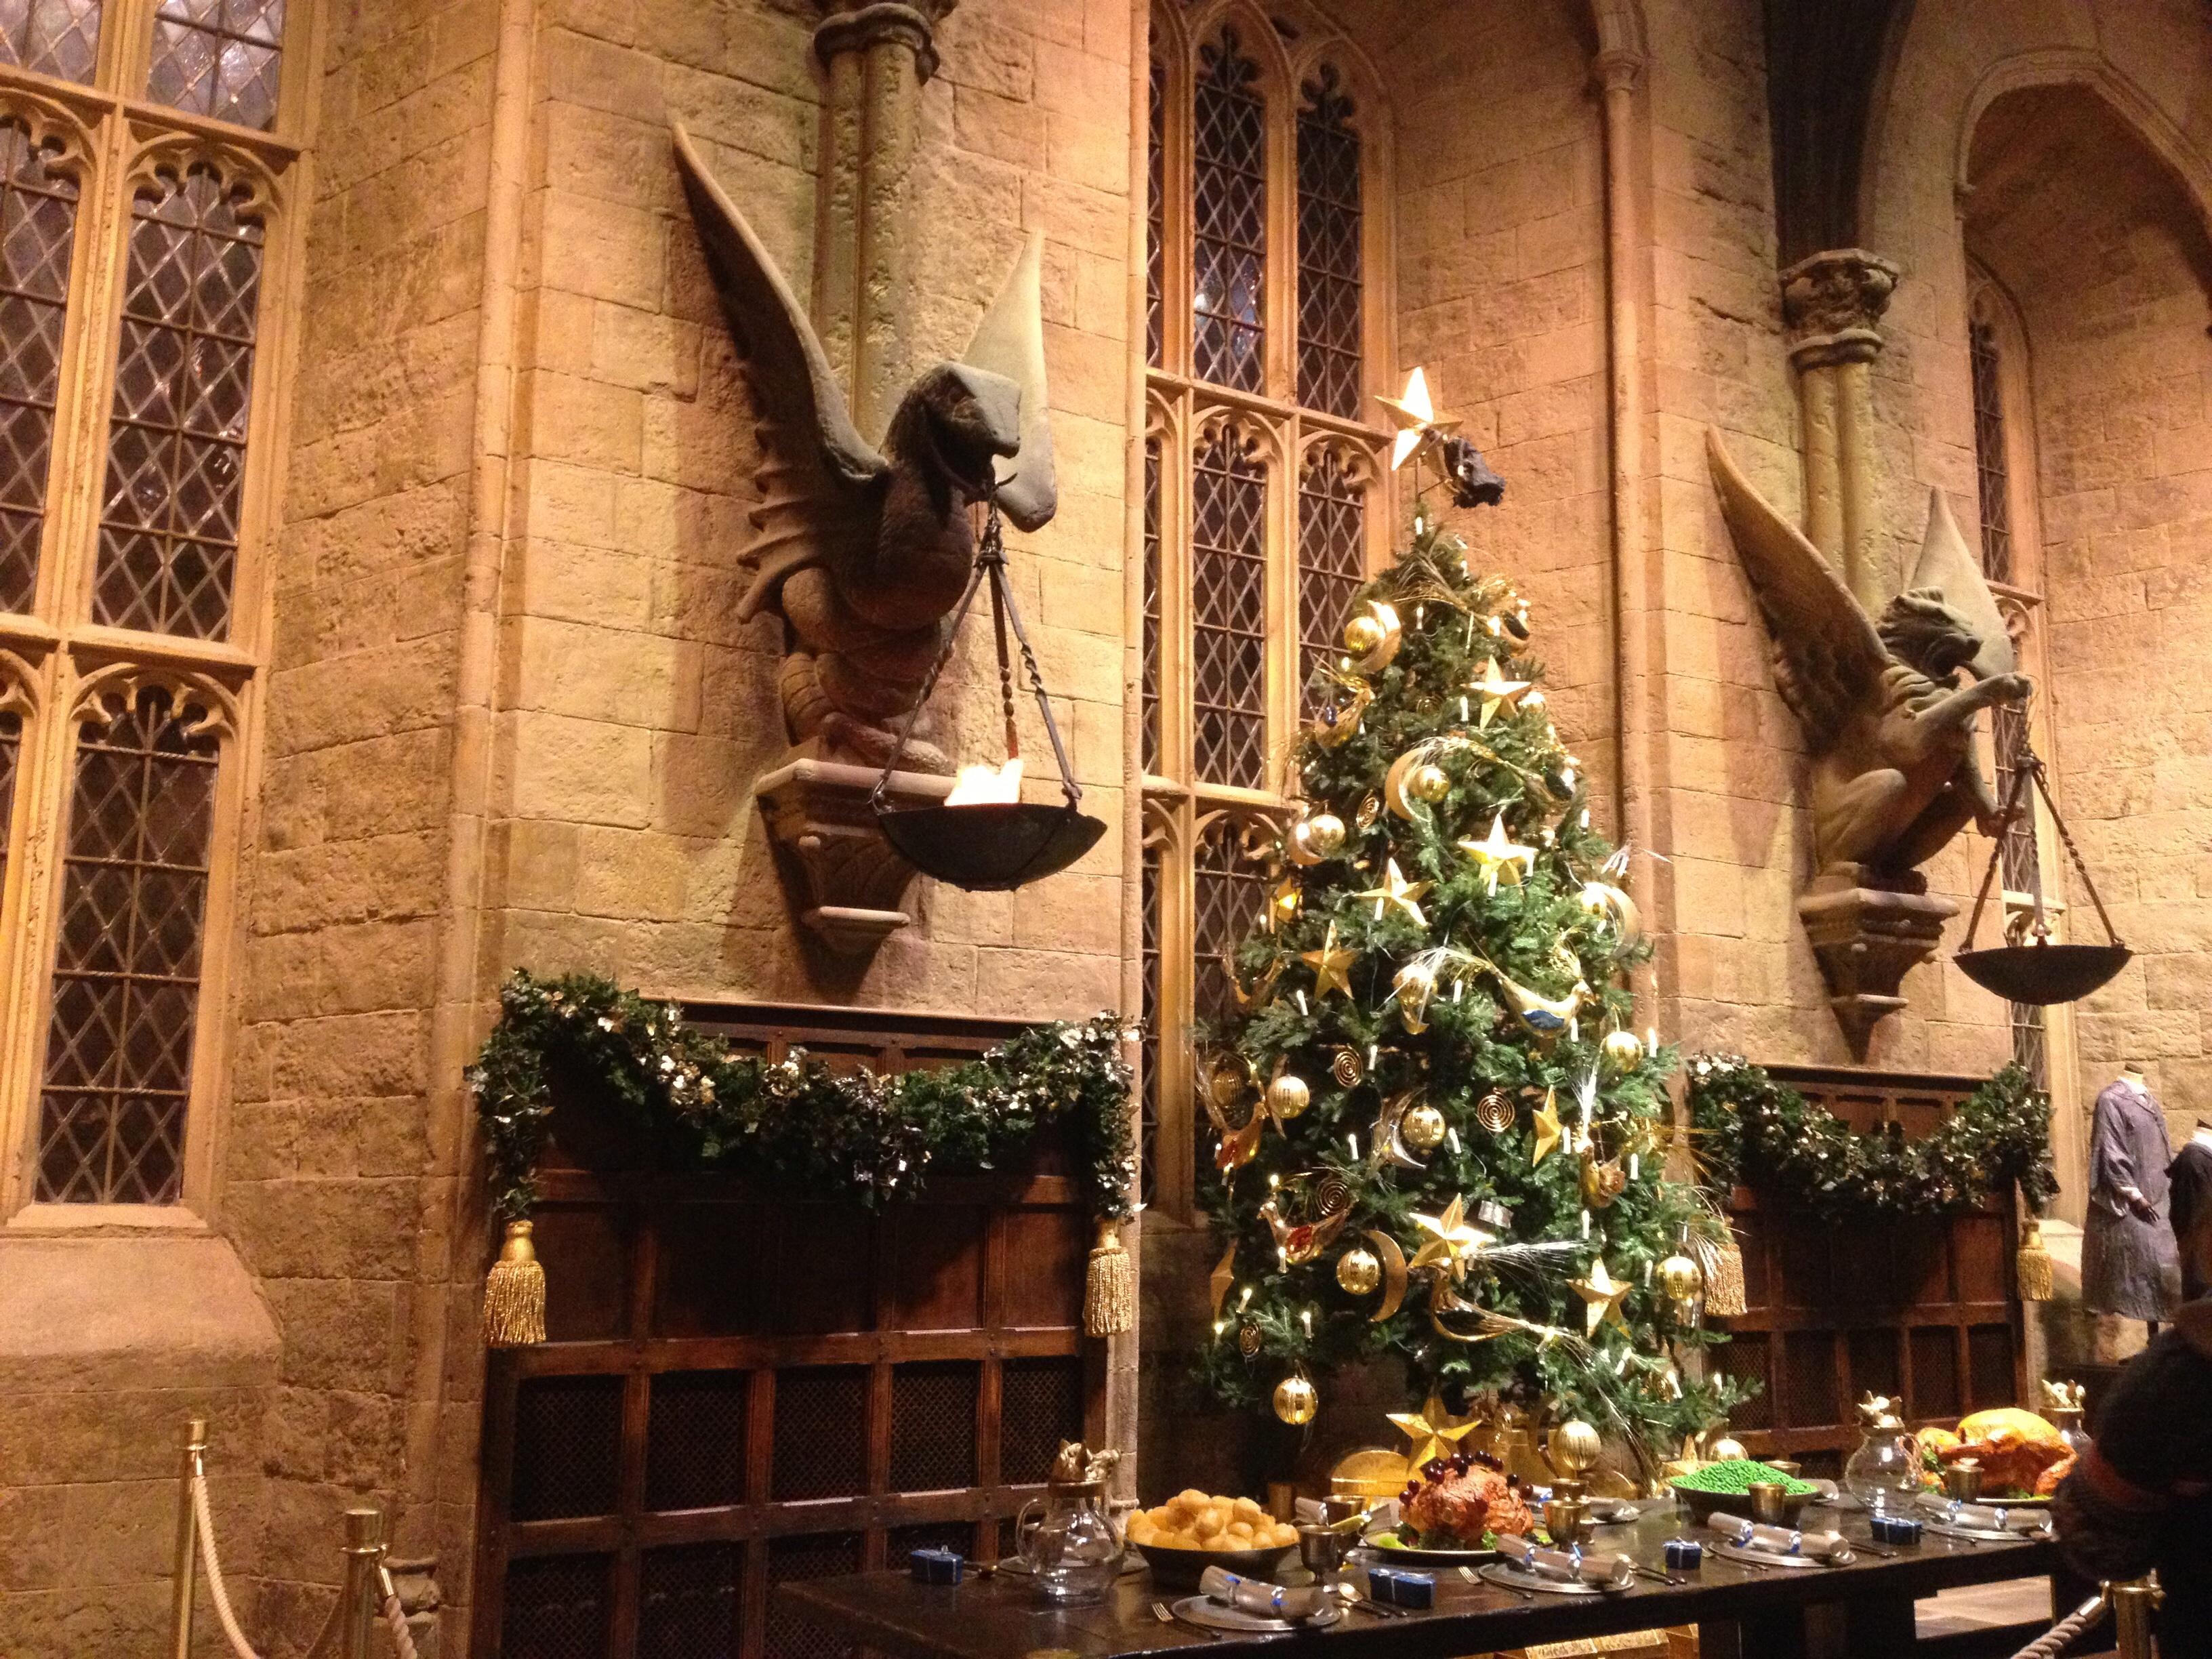 Harry Potter studio tour Great Hall